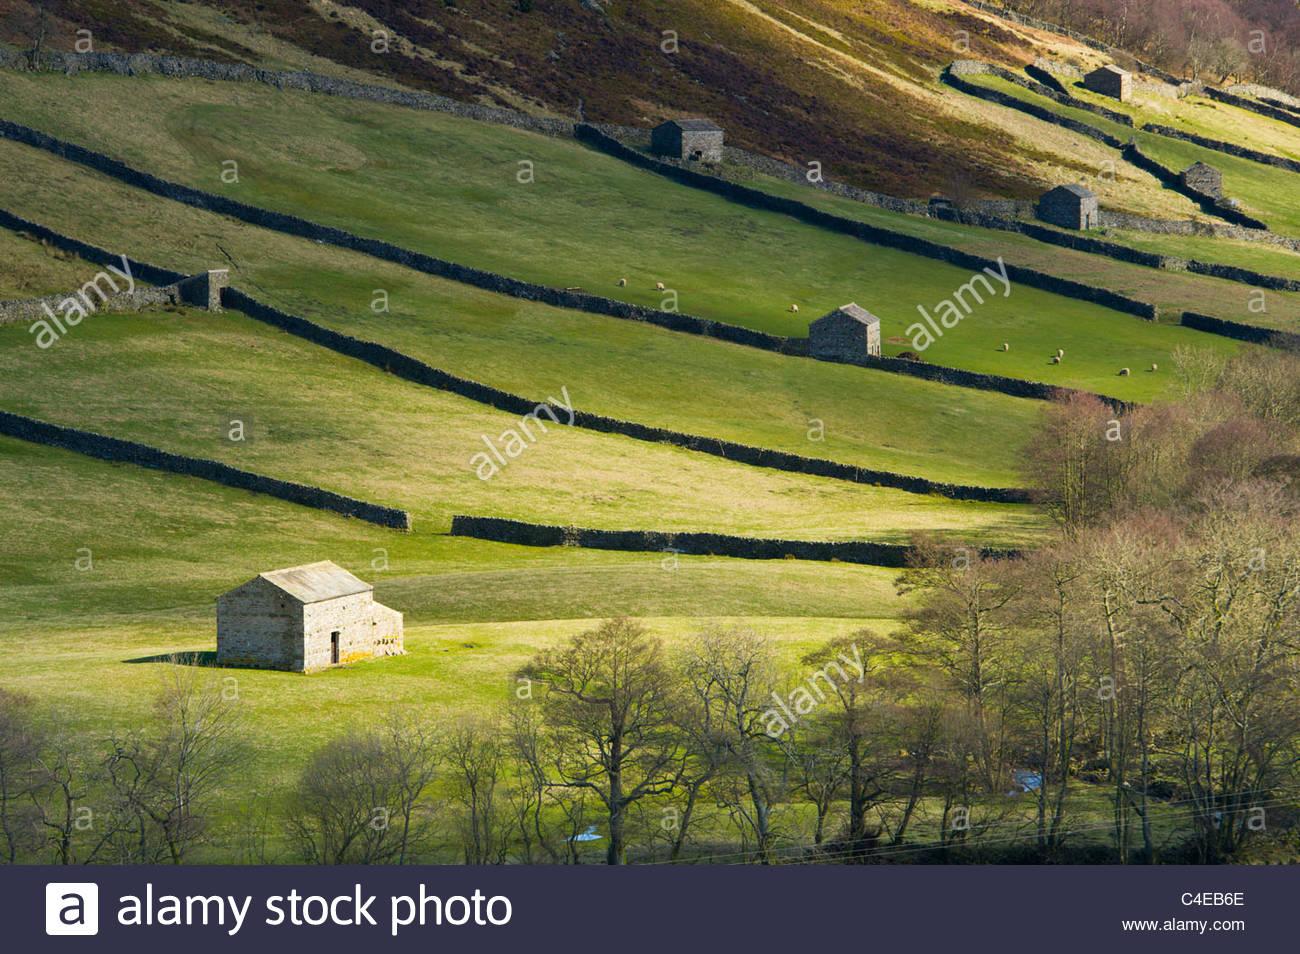 Traditional stone barns, Swaledale, Yorkshire Dales National Park, England - Stock Image